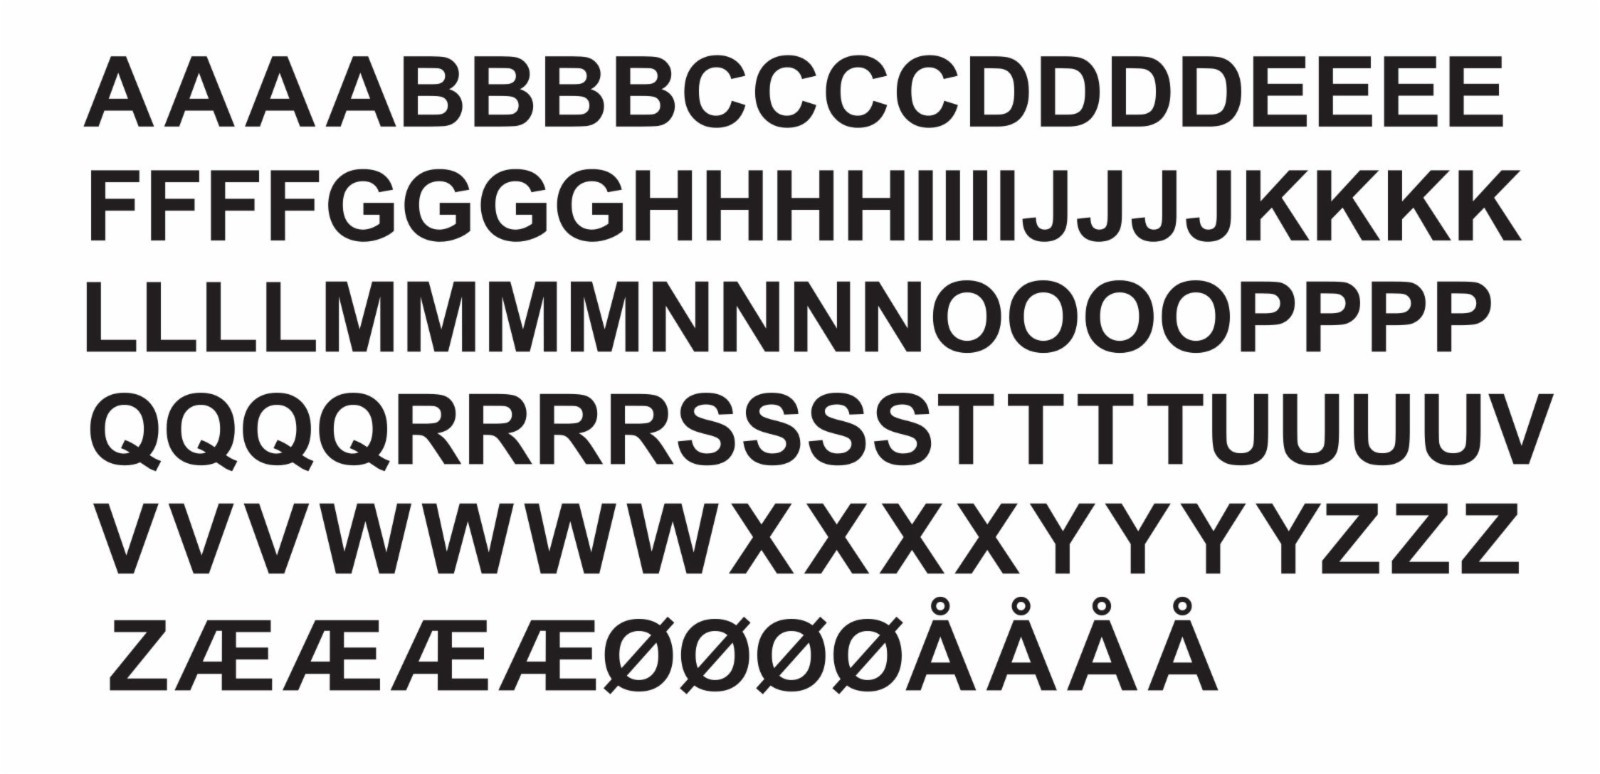 Selvklebende bokstaver, HxB 230x140 mm, sett A – Z